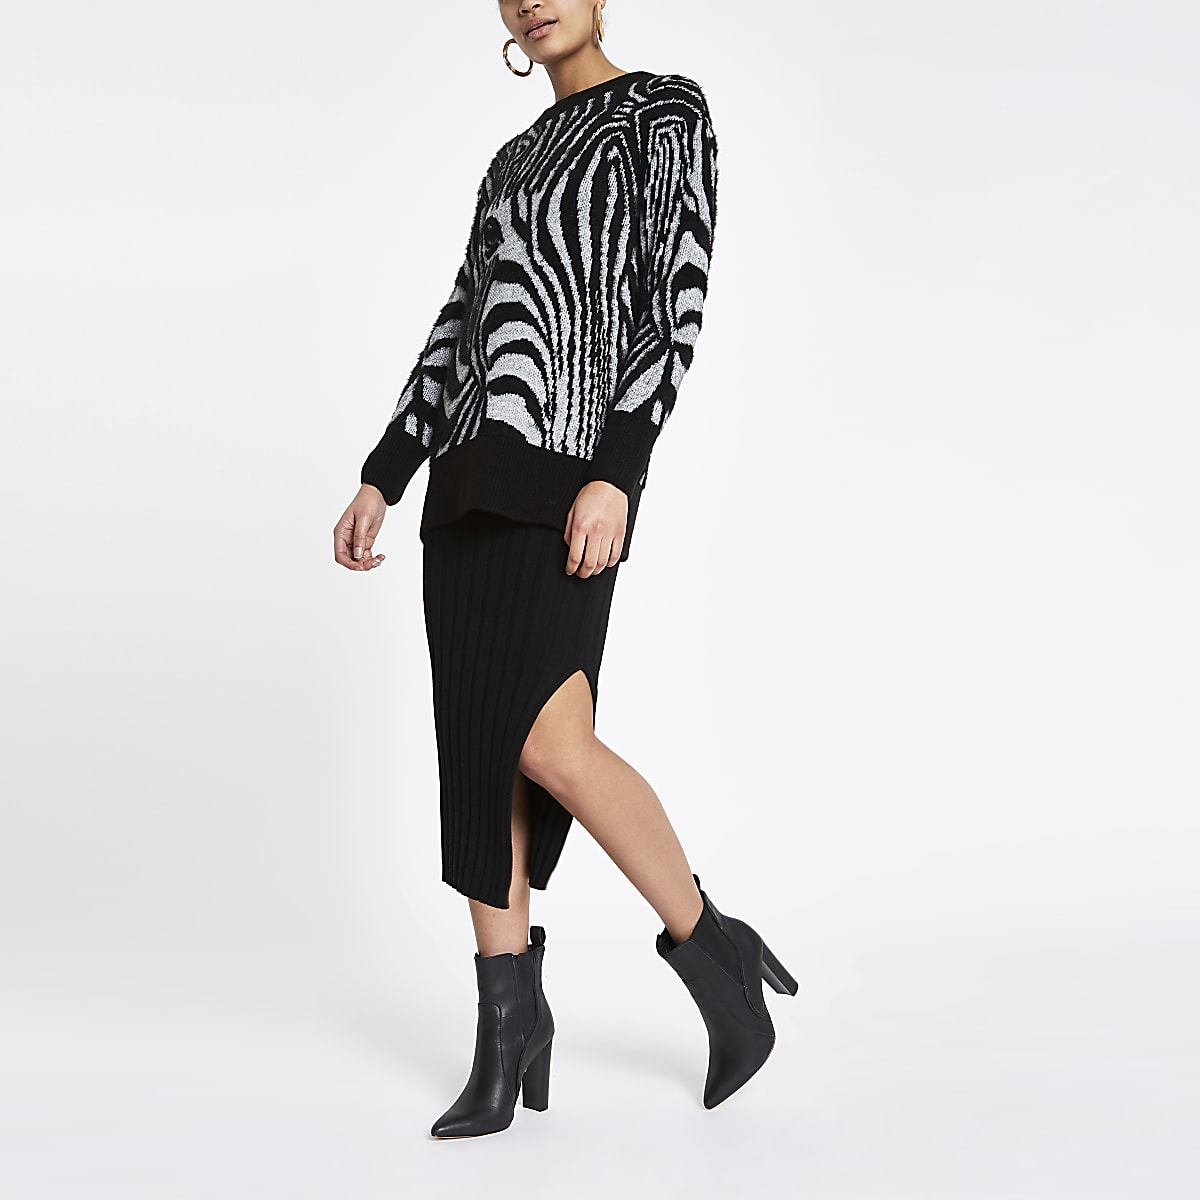 Black zebra face print sweater